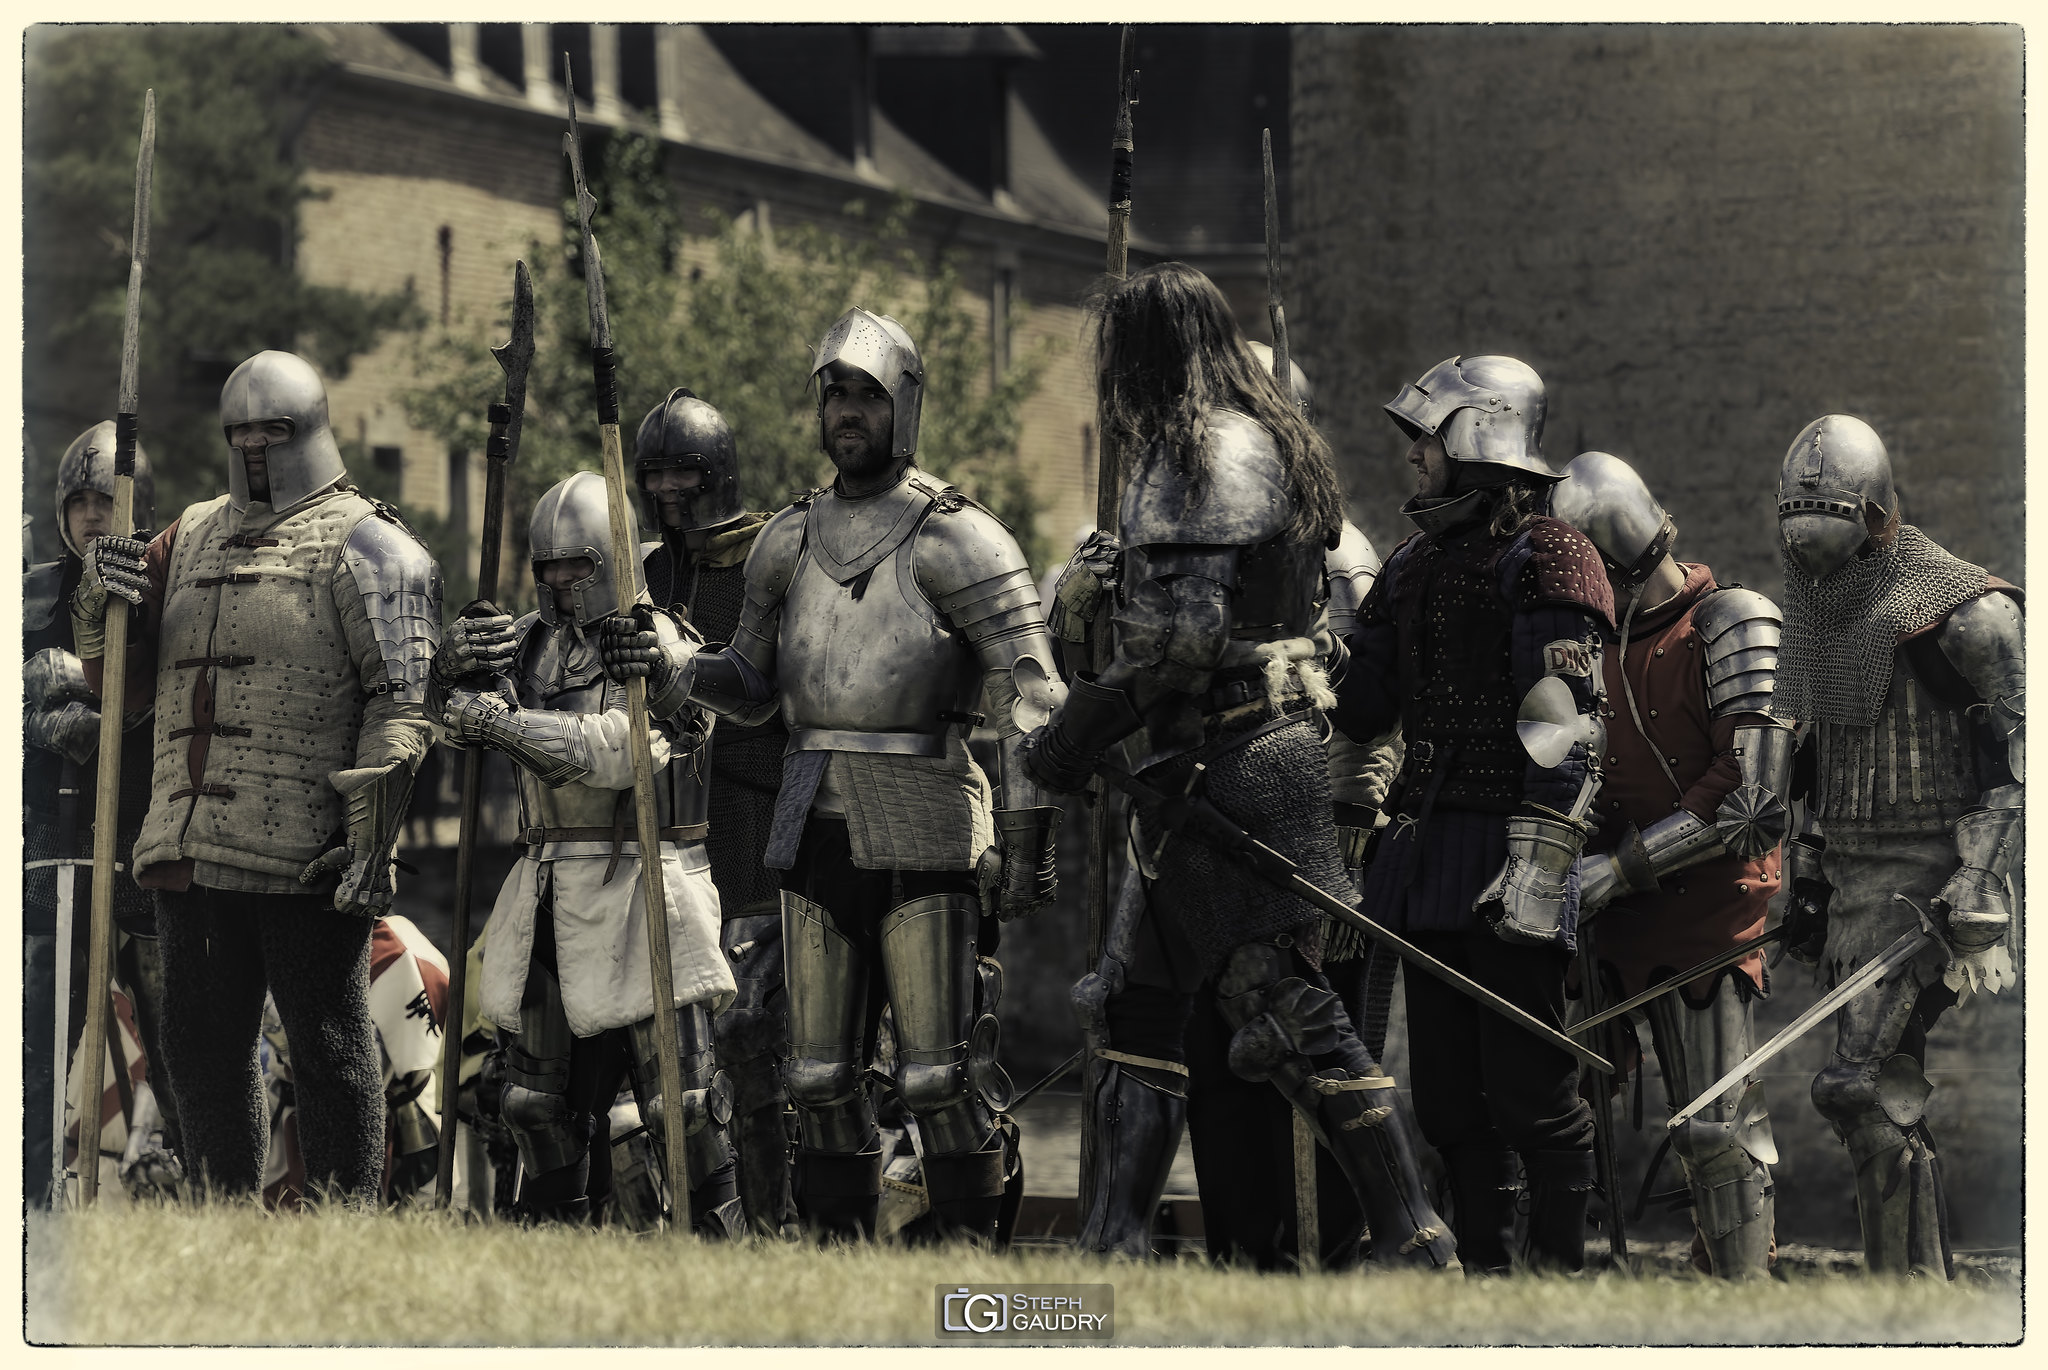 Revue des troupes [Click to start slideshow]